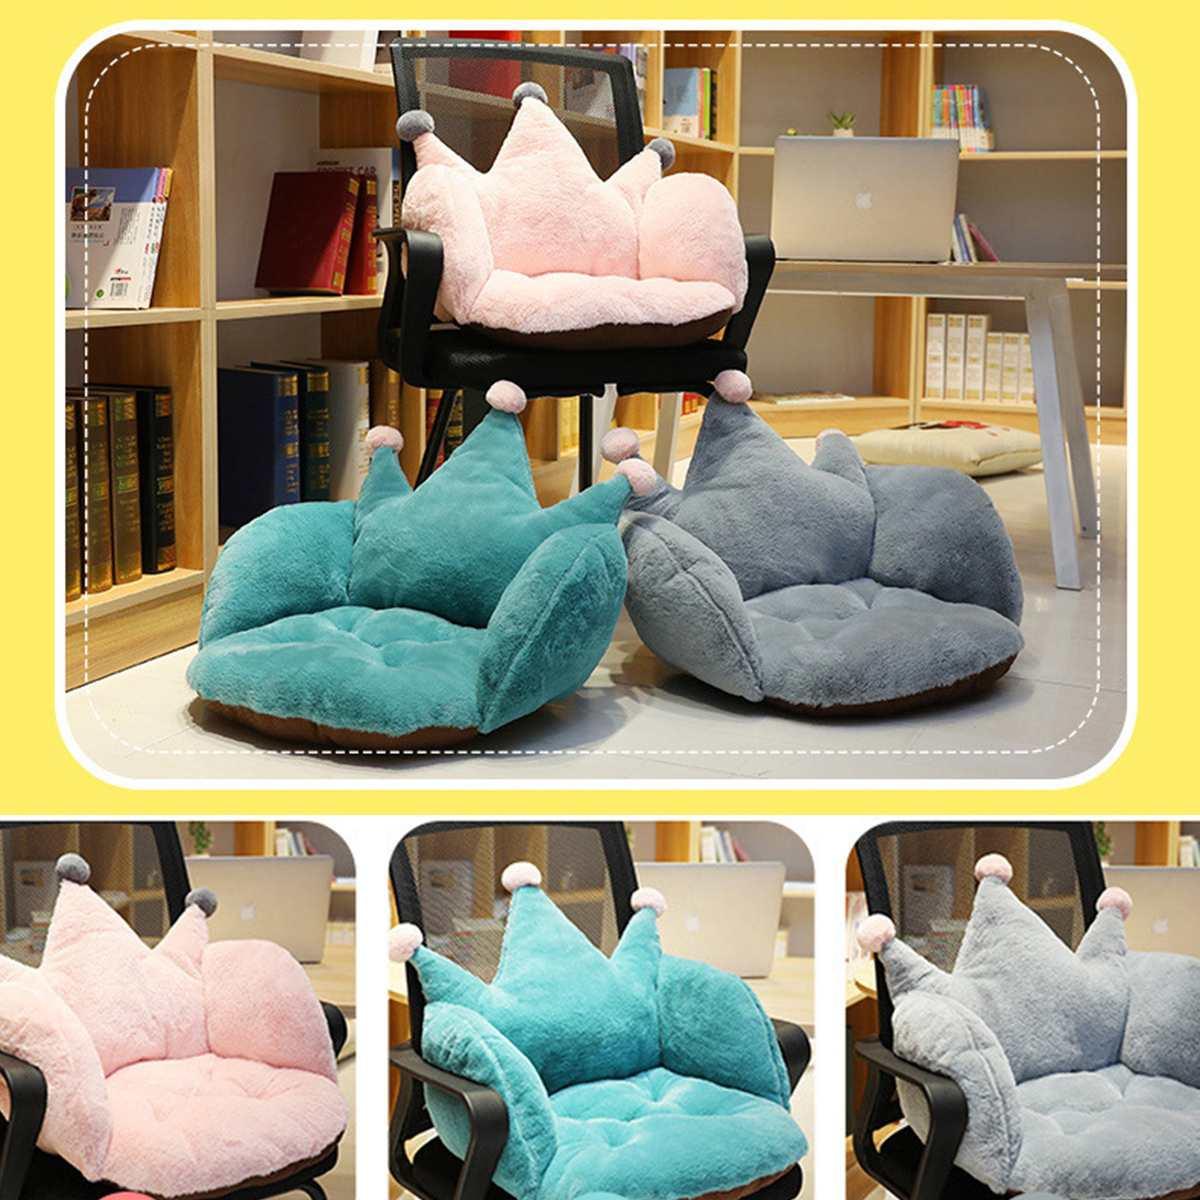 Soft Crown Seat Chair Back Cushion Waist Lumbar Pillow Waist Support Plush Backrest For Sofa Office Home Kids Room Decoration